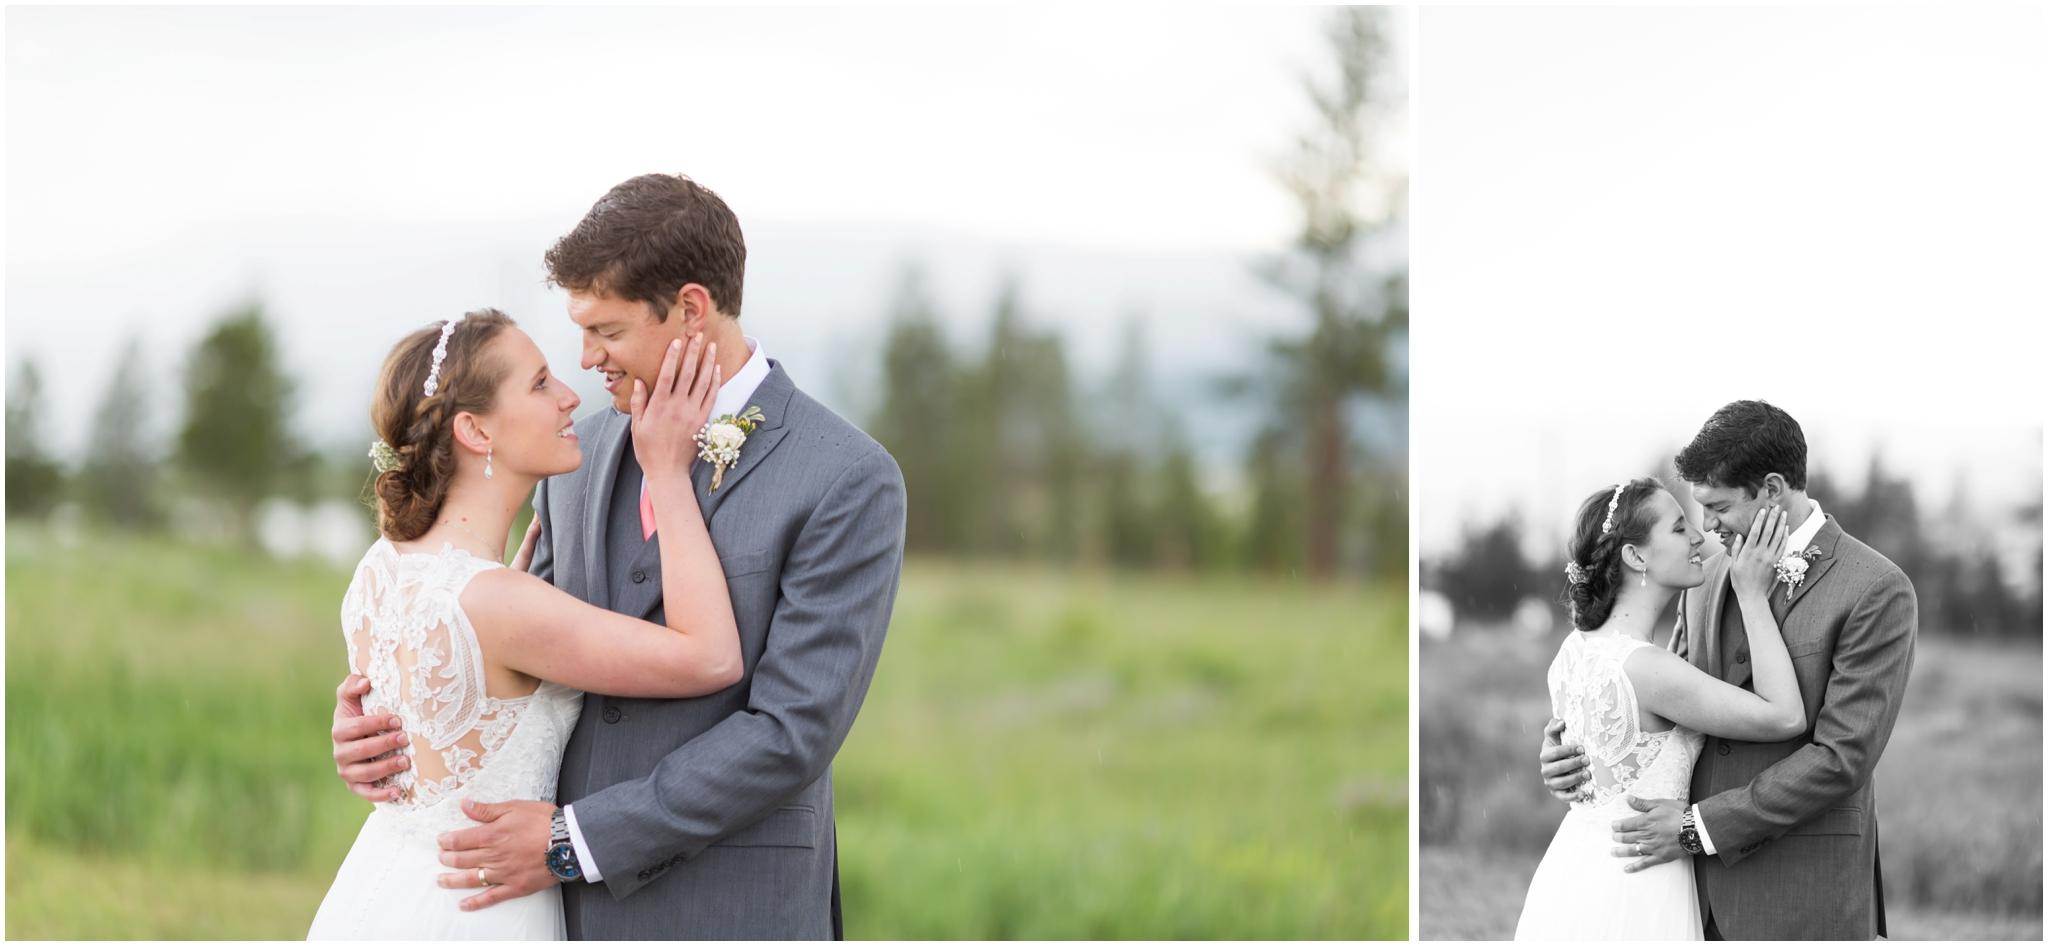 Strawberry_Creek_Ranch_Wedding_Photographer25.jpg